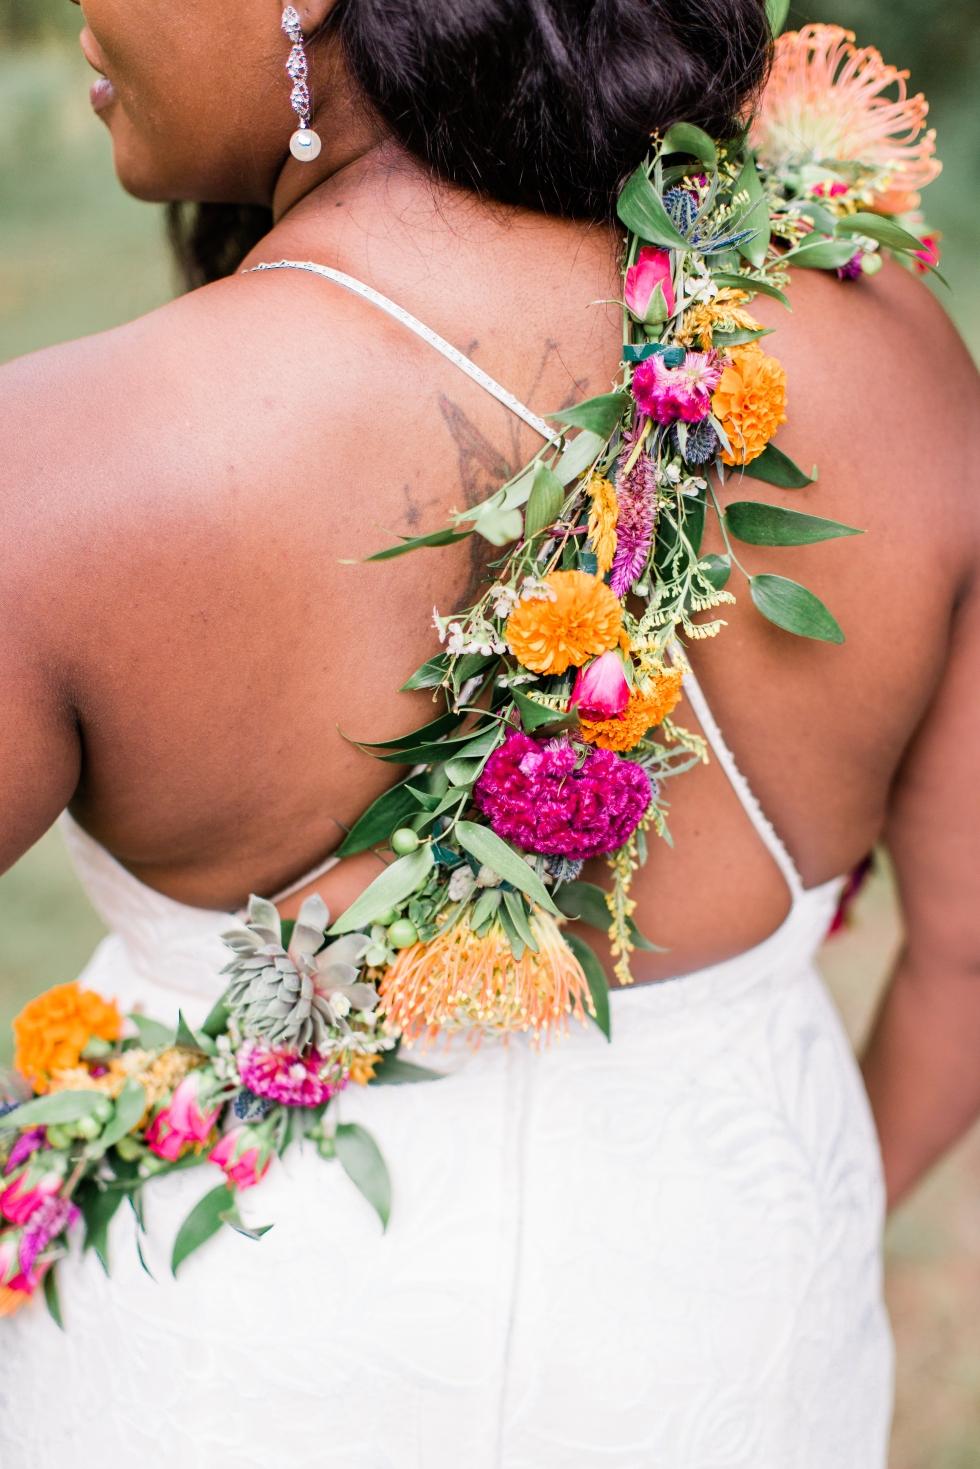 erv_wearable_florals_2018_120